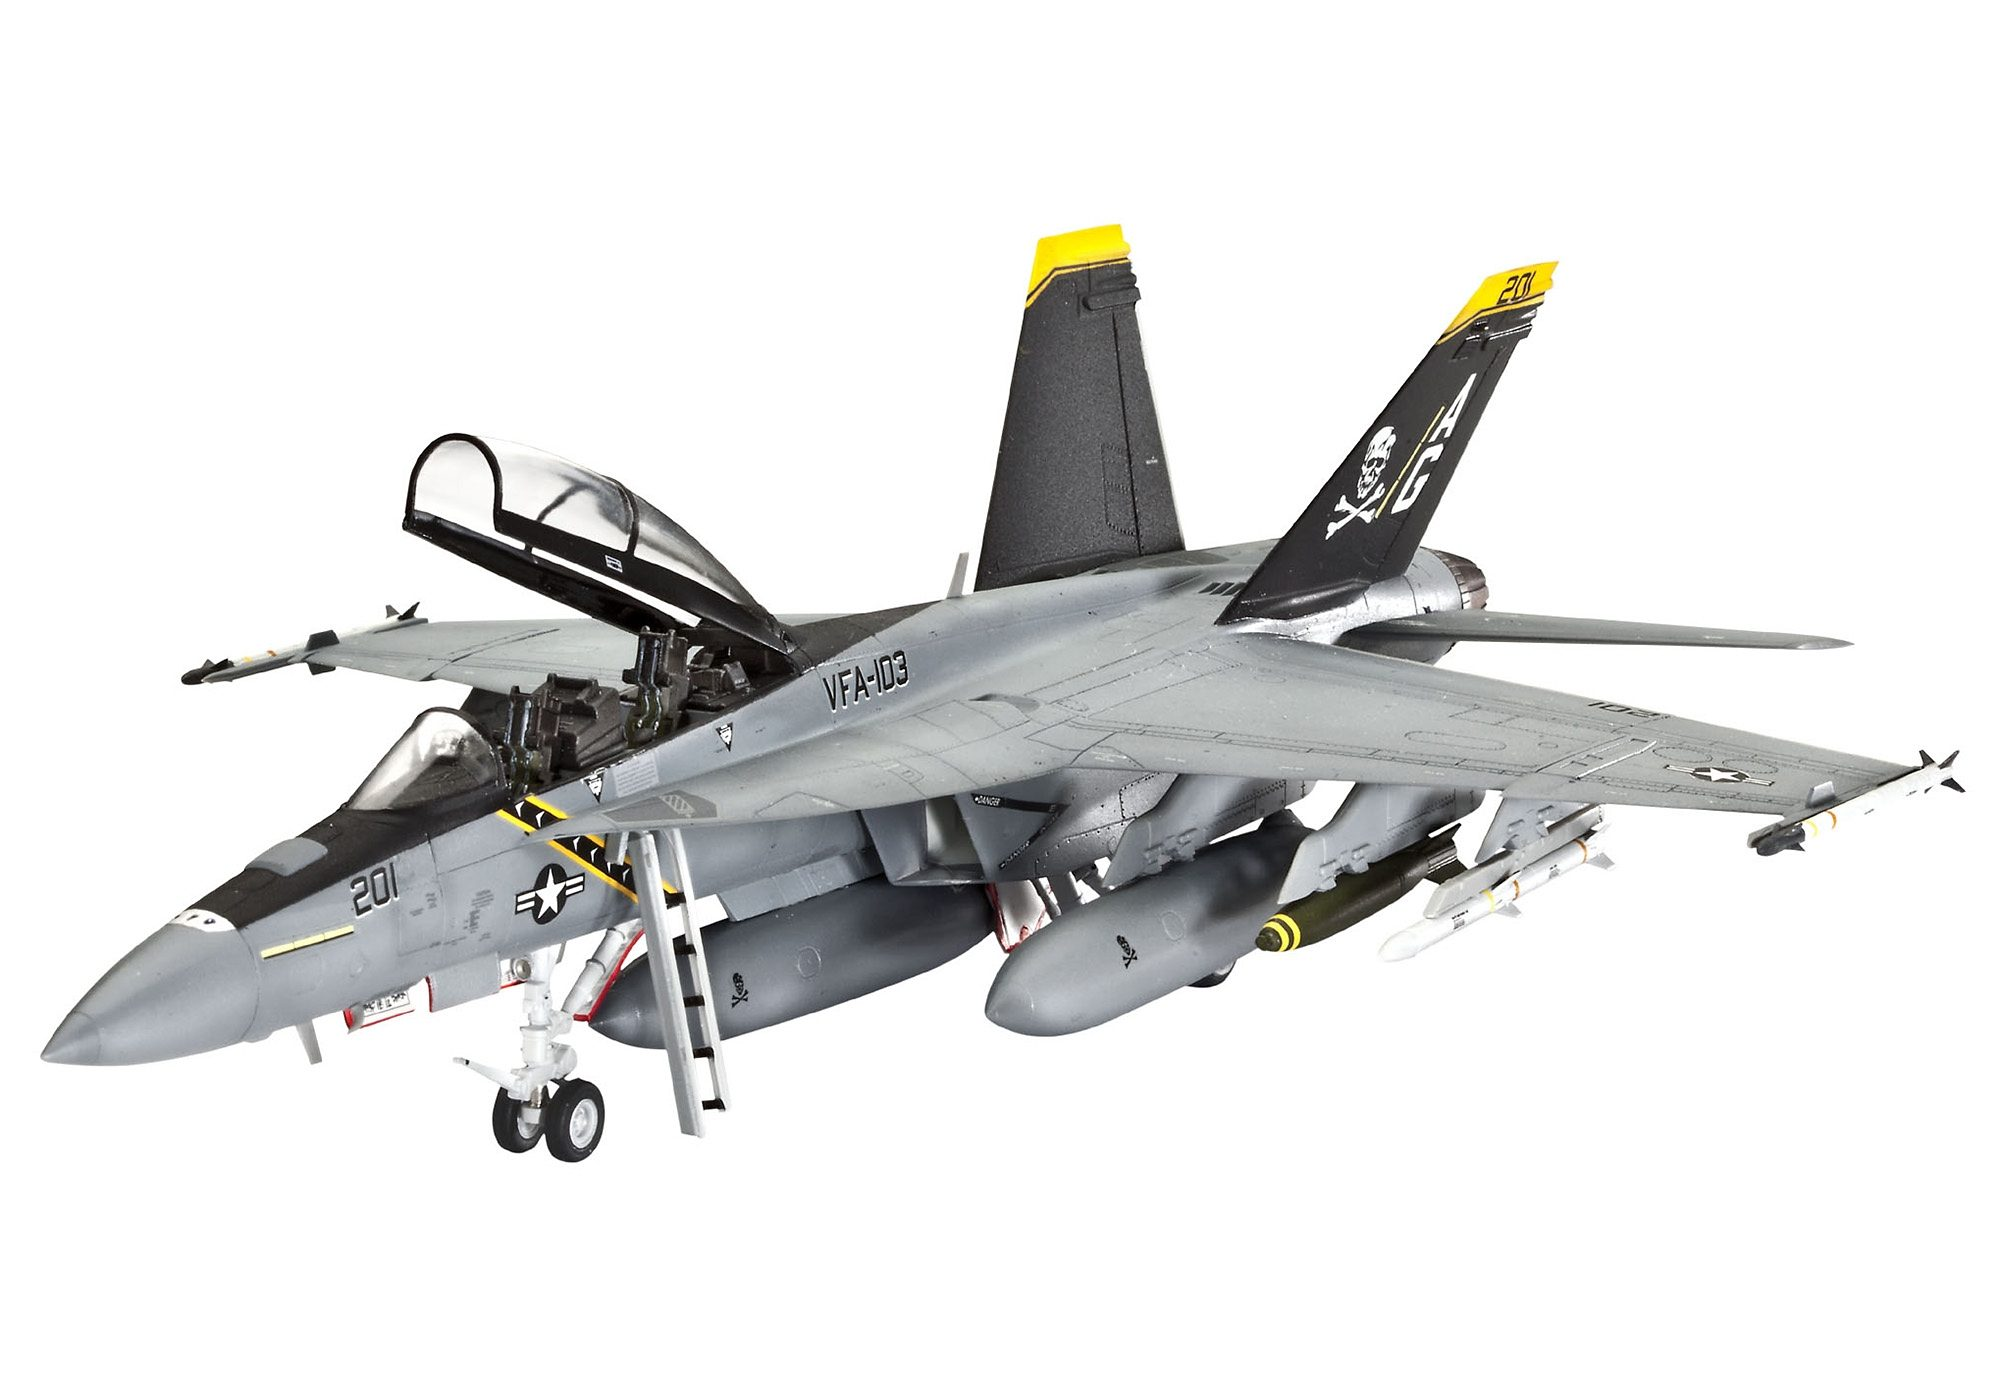 Revell® Modellbausatz Flugzeug, »F/A-18F Super Hornet twin seater«, 1:72